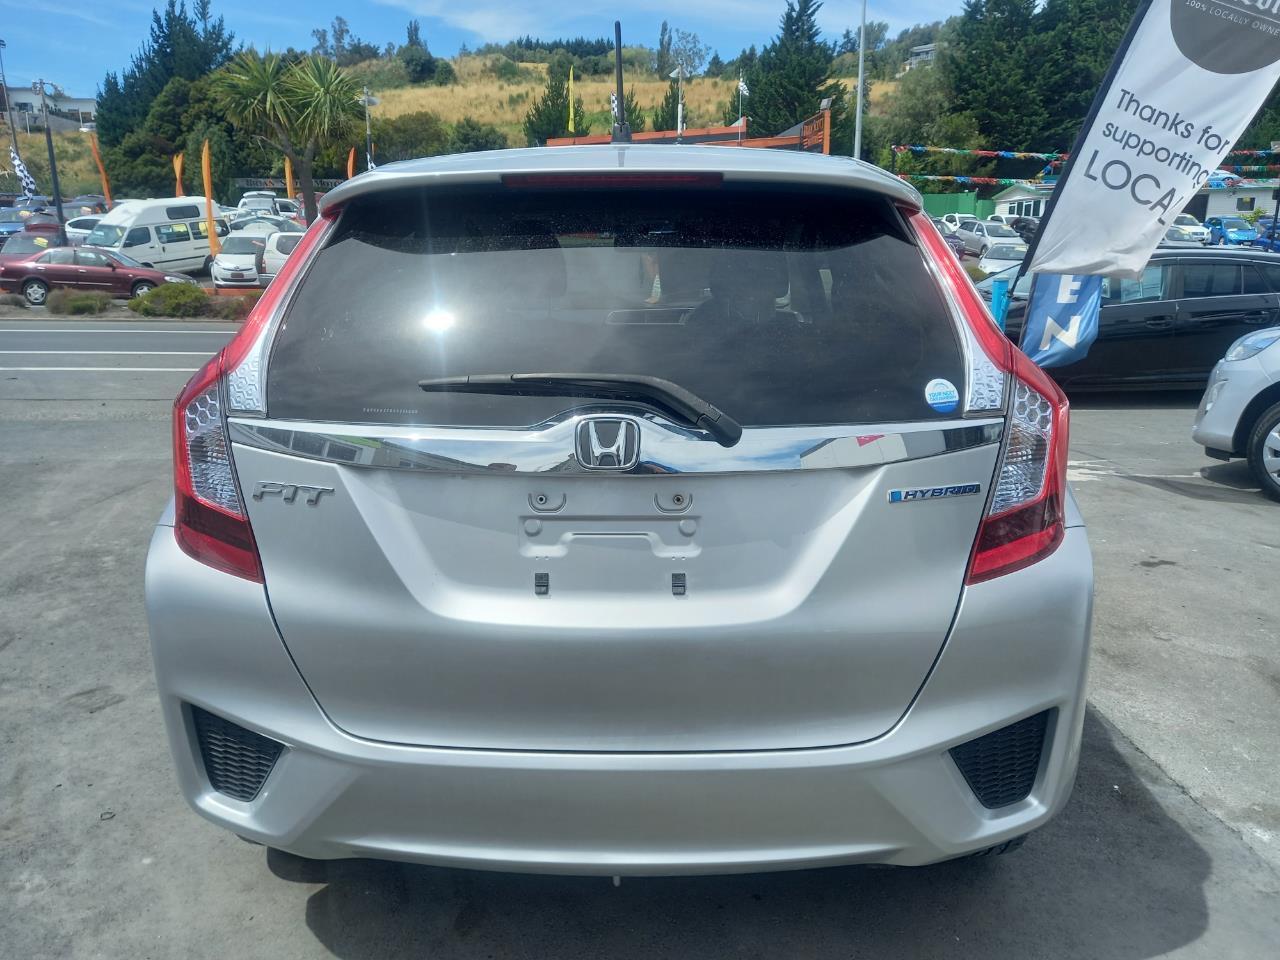 image-7, 2015 Honda Fit Hybrid No Deposit Finance at Dunedin